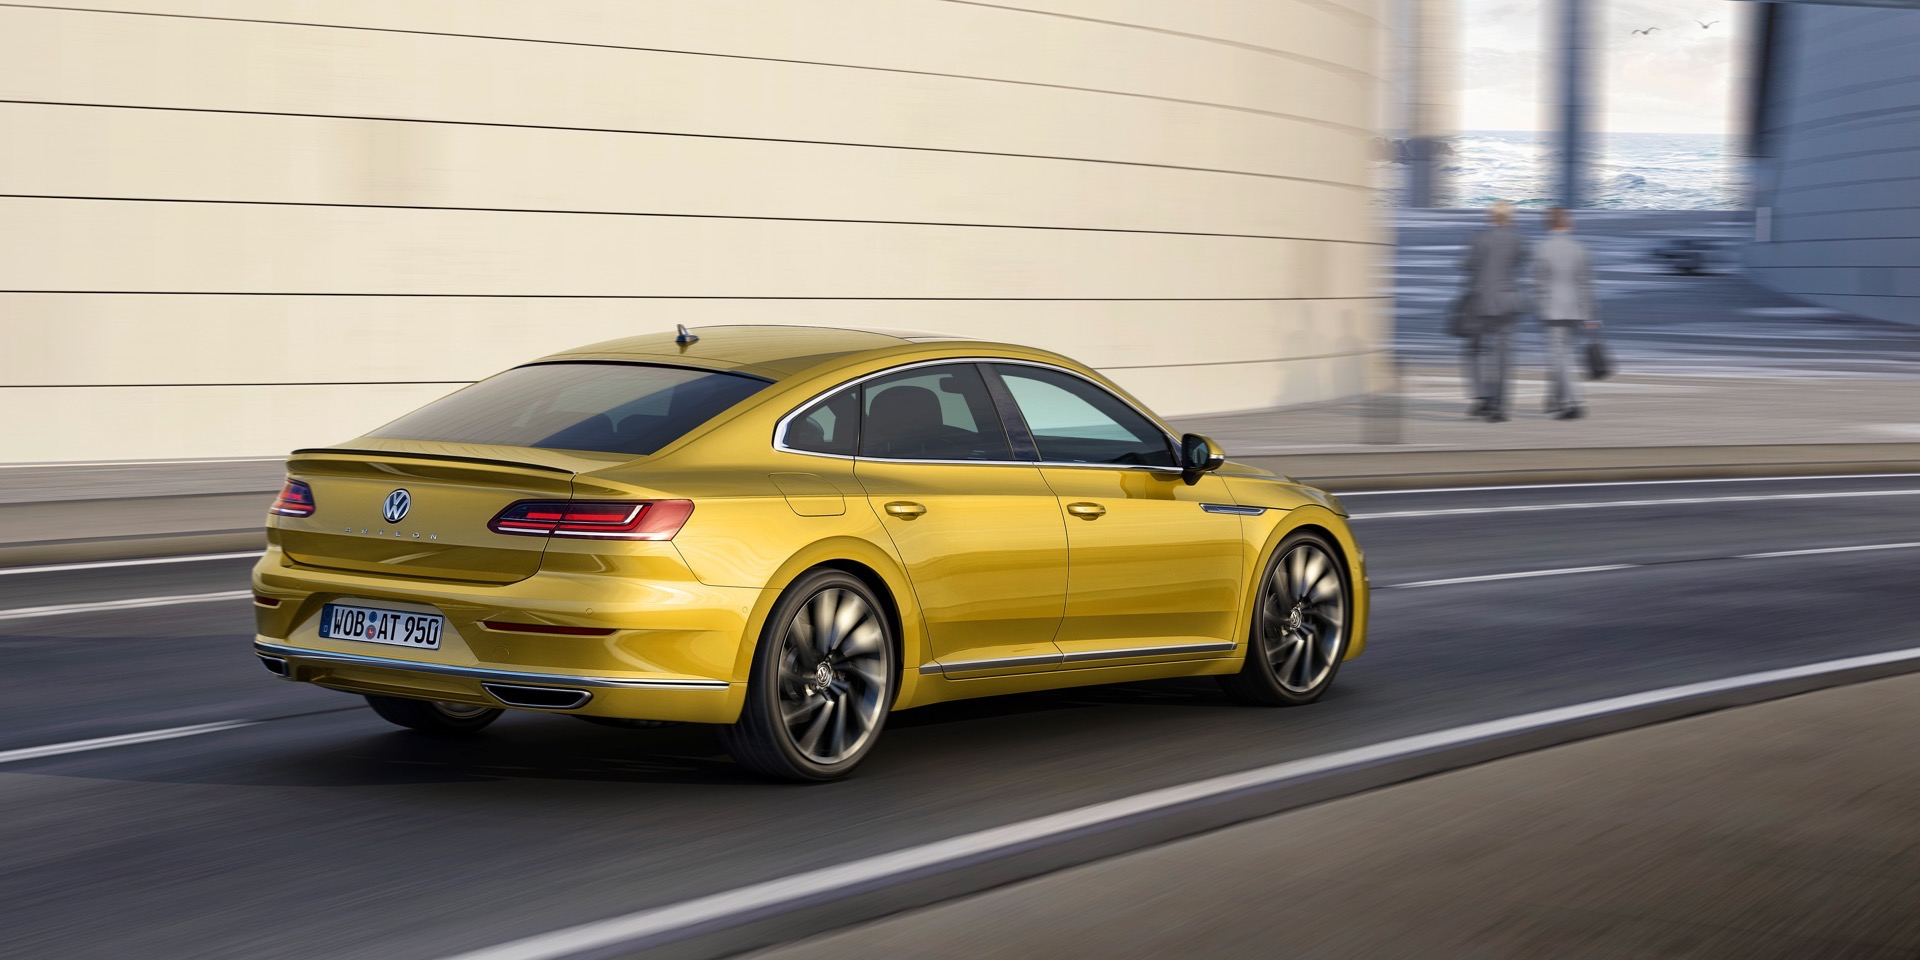 Porsche Panamera Coupe >> Volkswagen Arteon to rival BMW 6 Sereis Gran Coupe, Aud A7